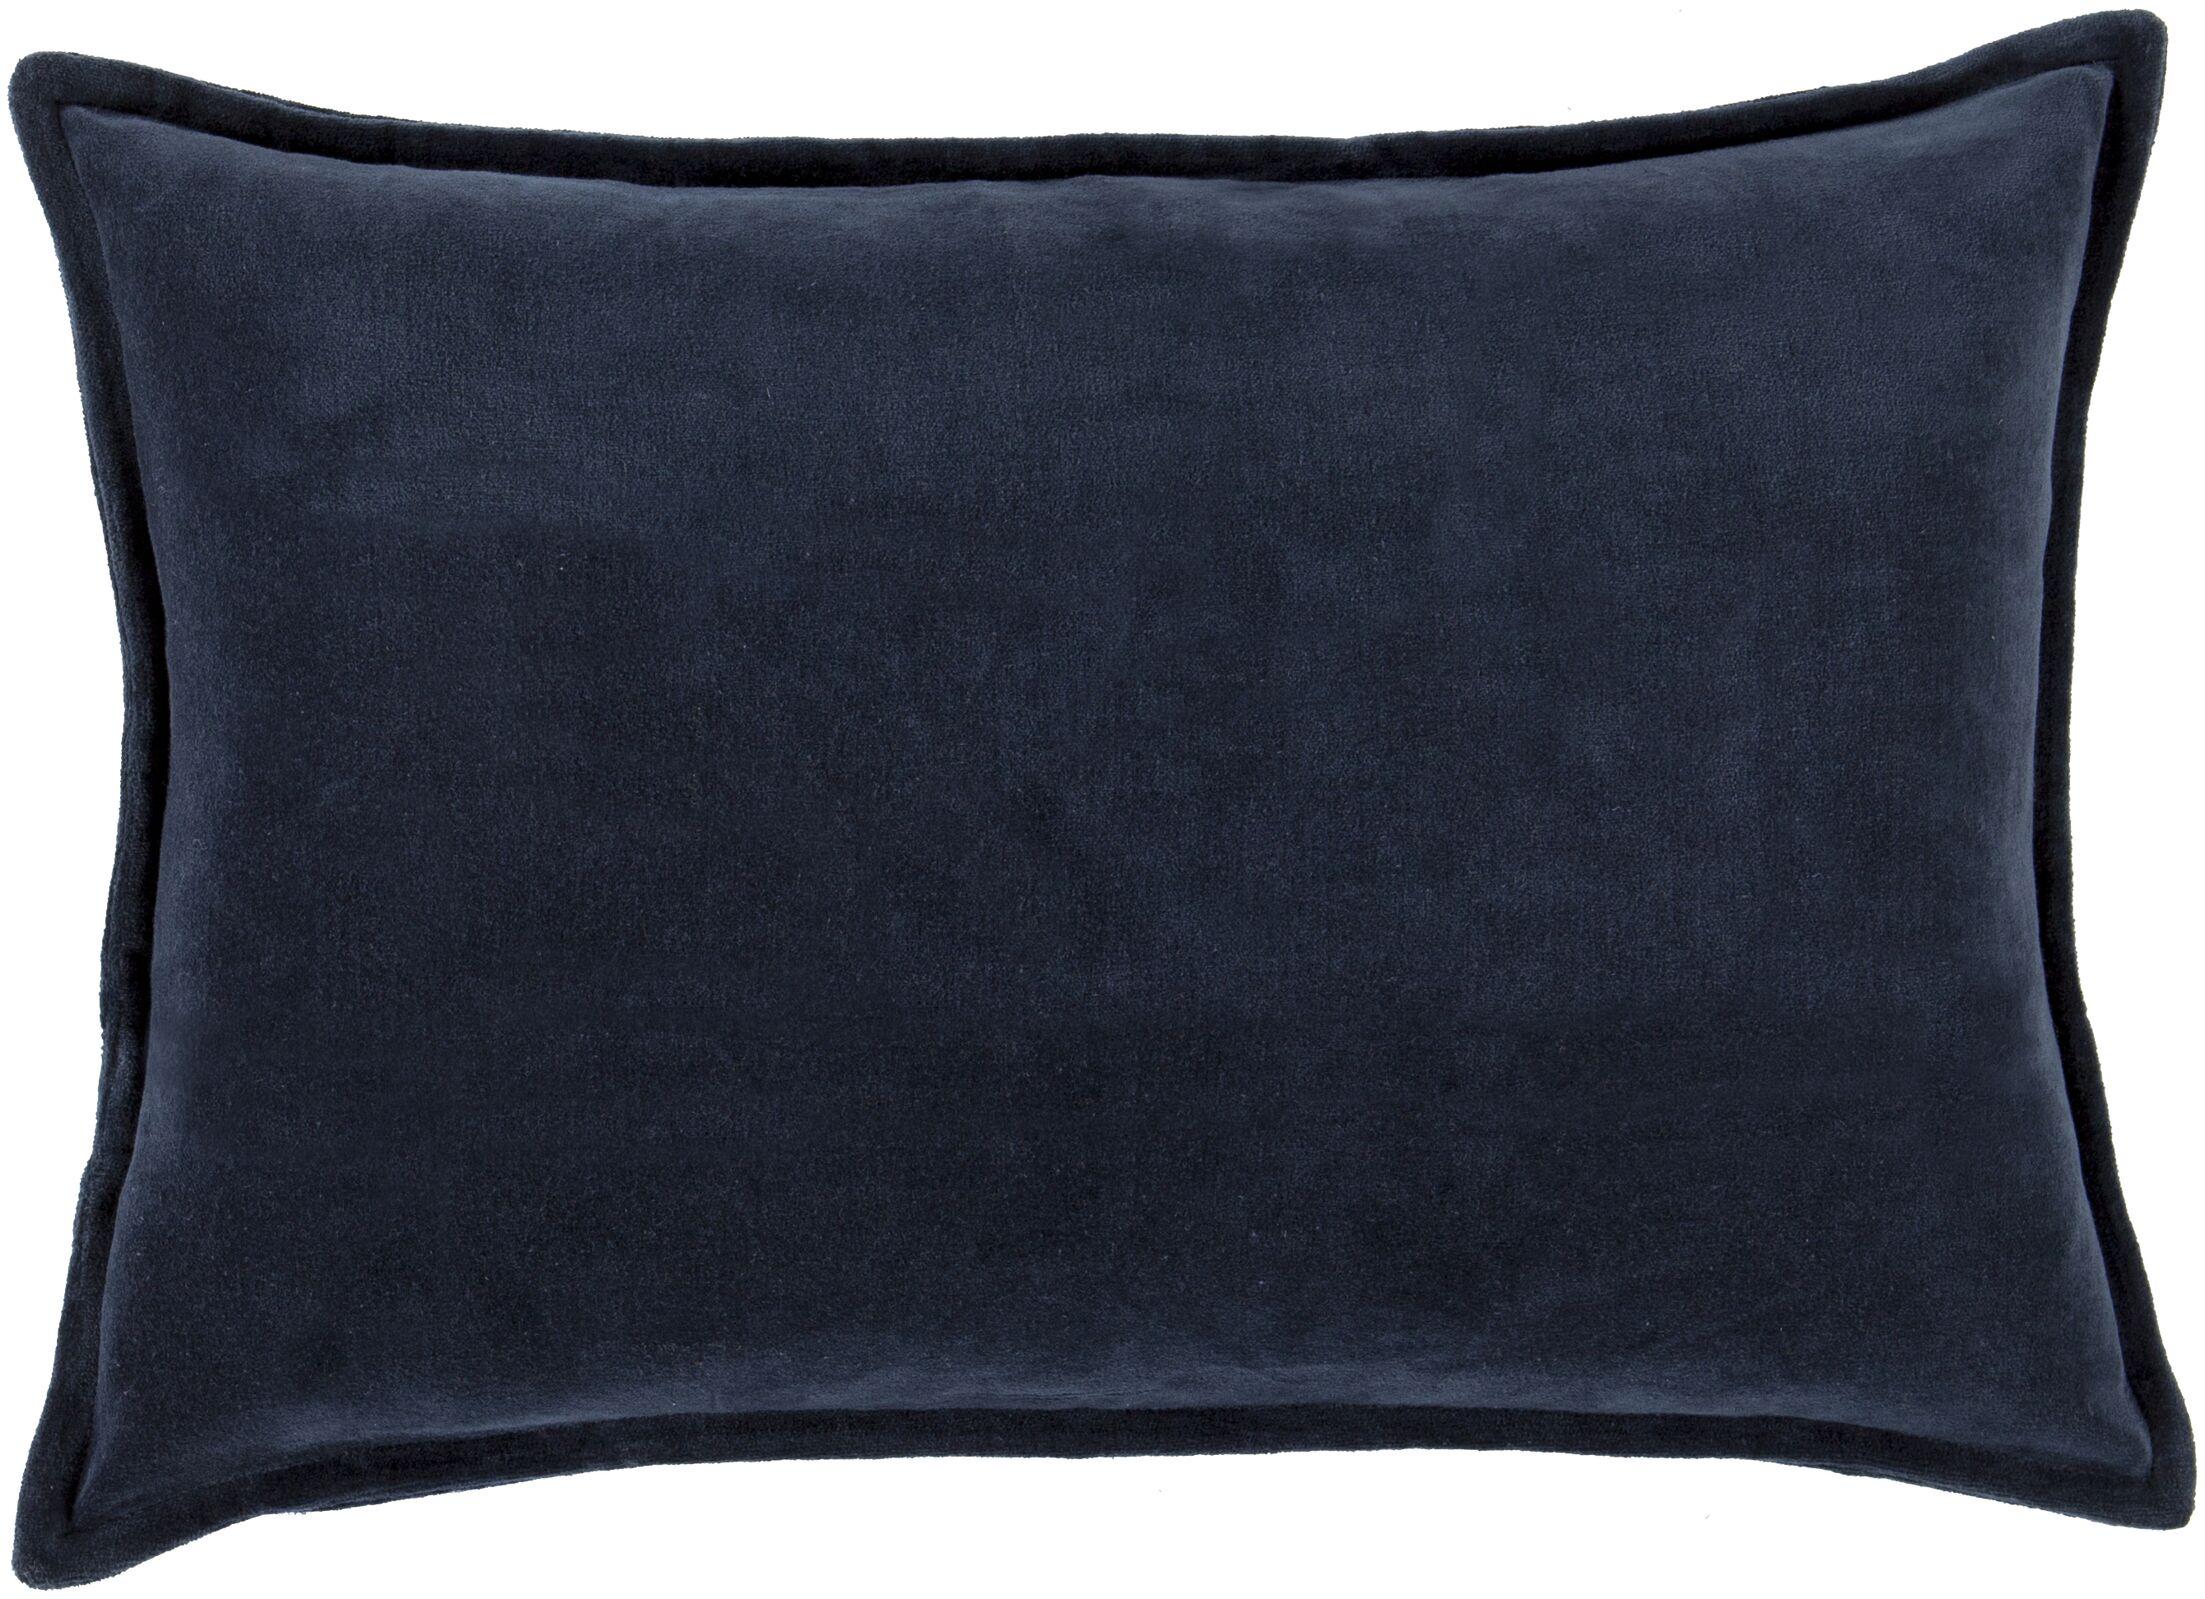 Cotton Lumbar Pillow Color: Dark Sky Blue, Fill Material: Down